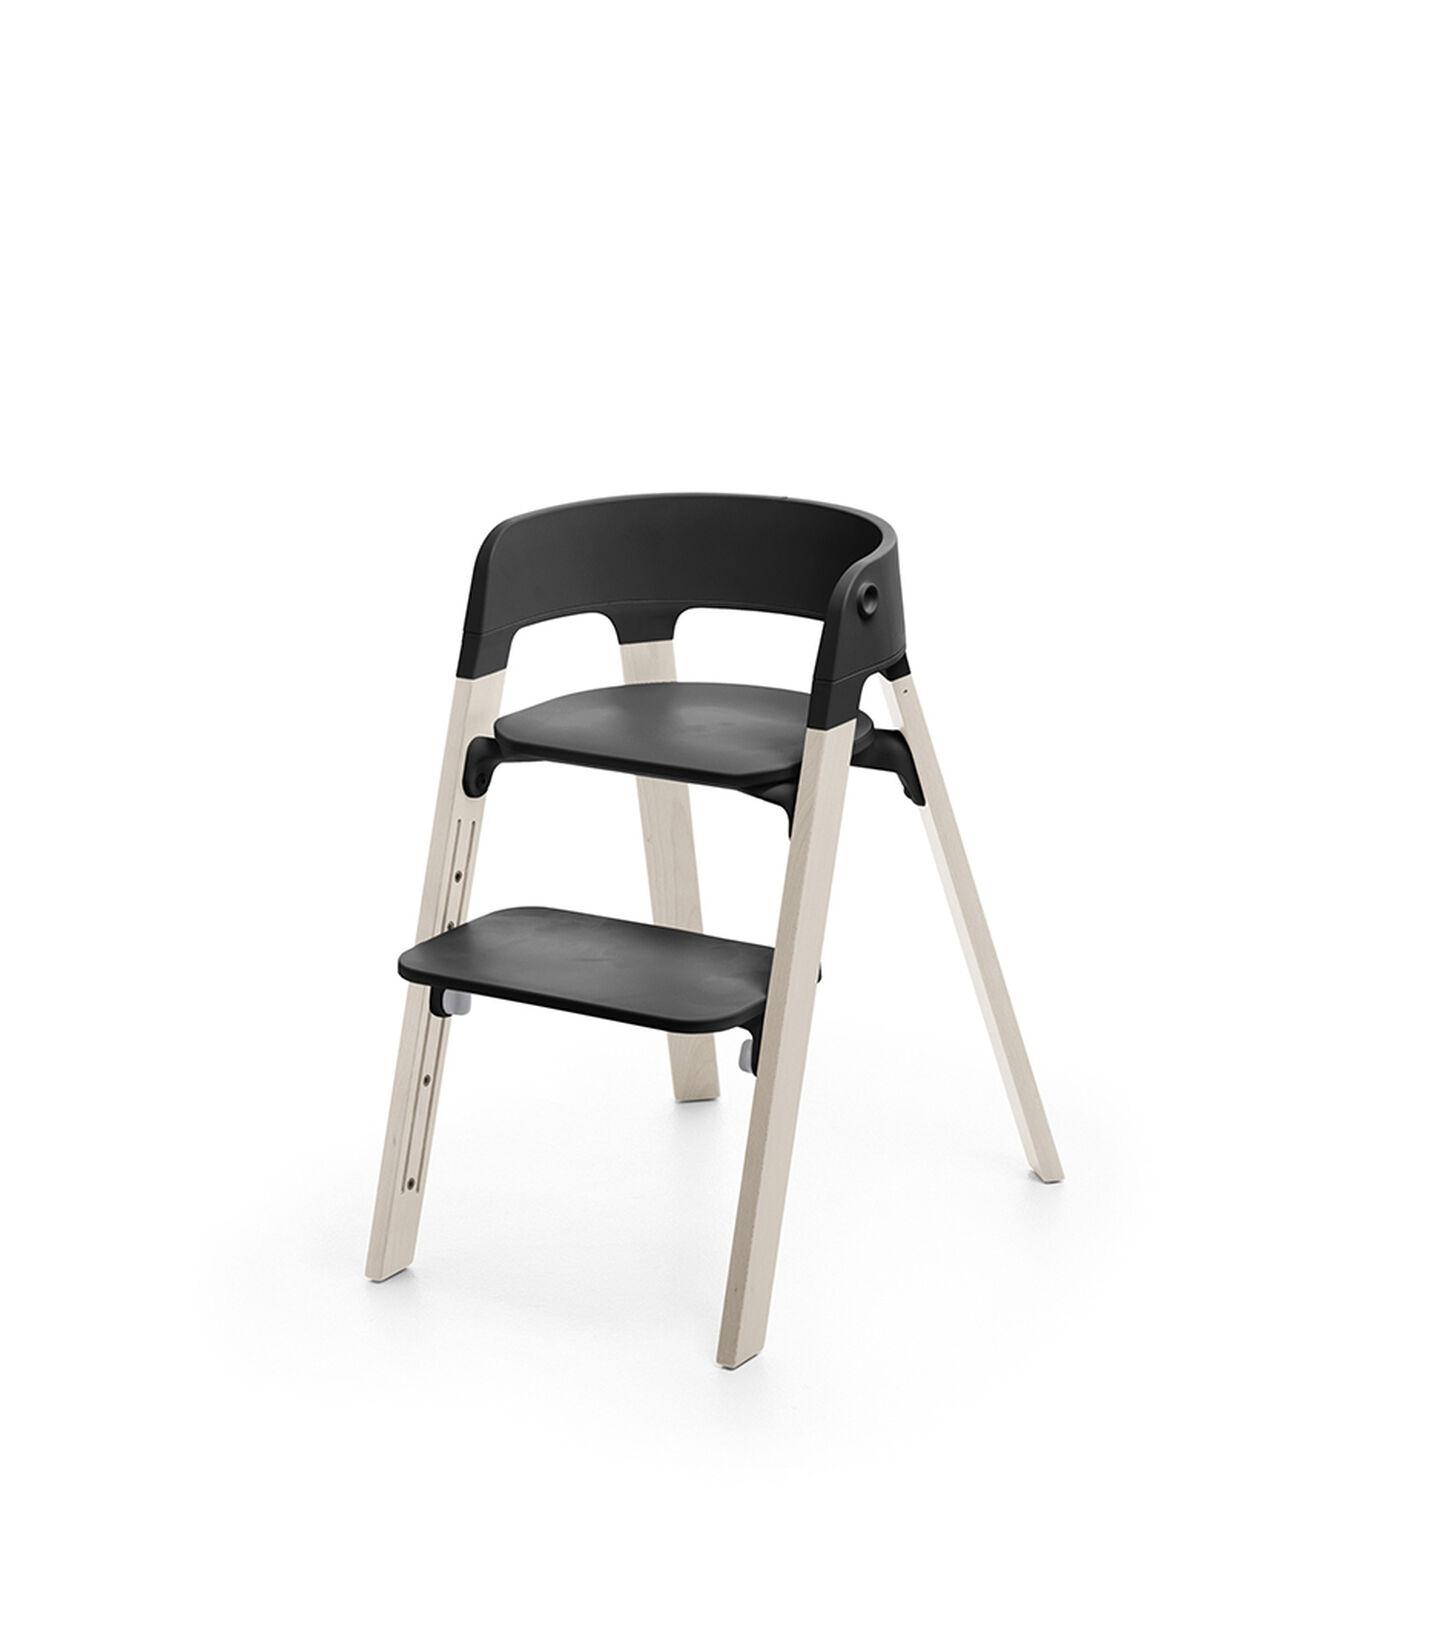 Stokke® Steps™ Chair Black Seat Whitewash Legs (stokke.com), Whitewash, mainview view 2